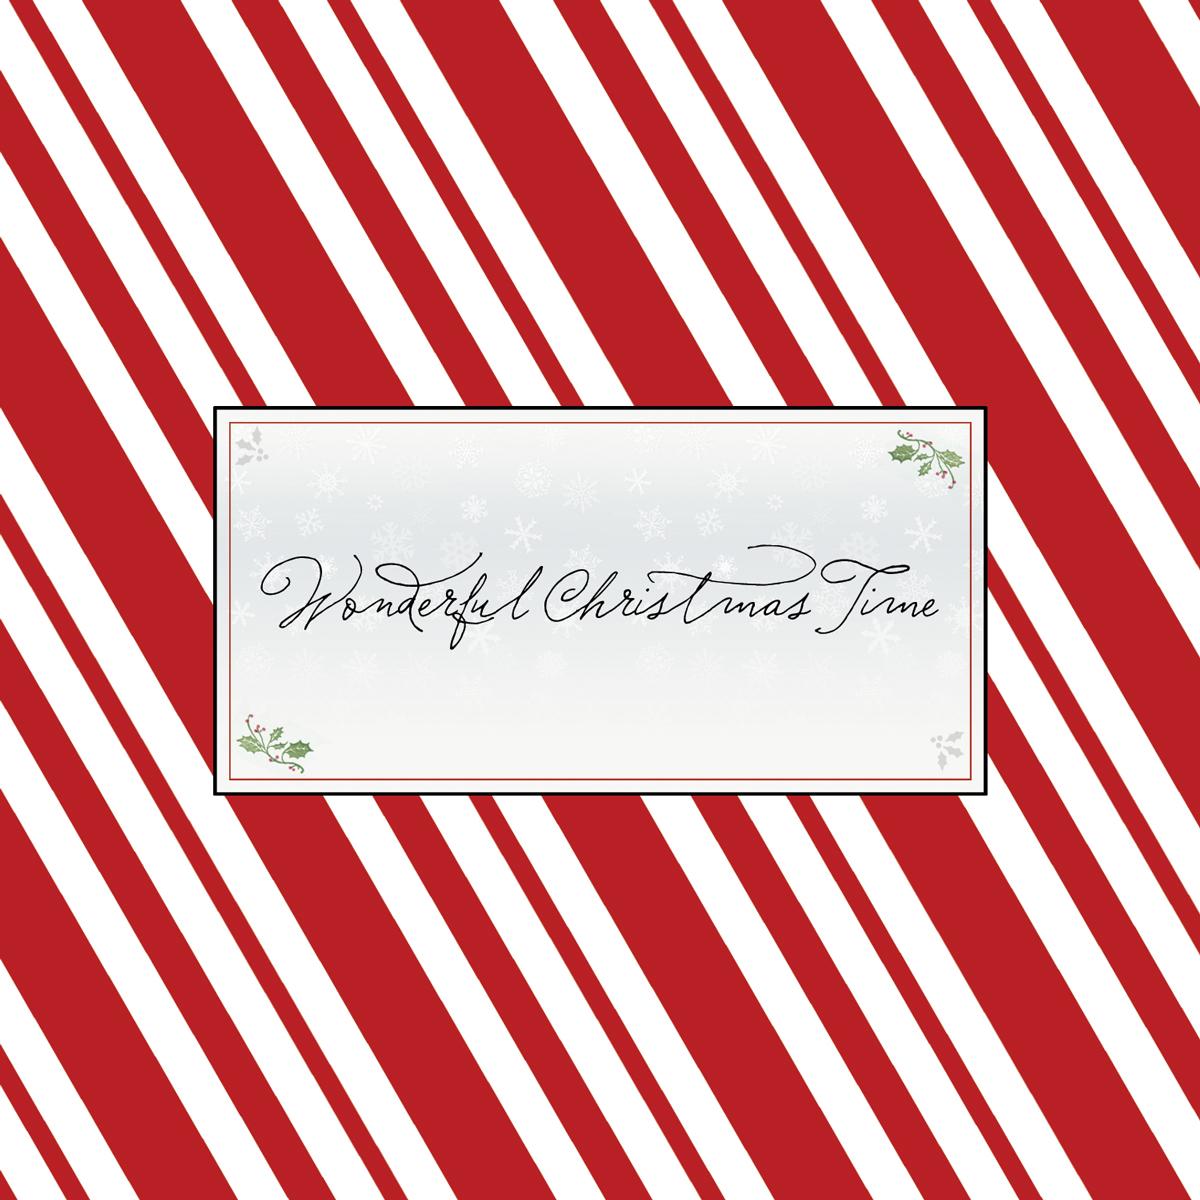 Wonderful Christmas Time.jpg